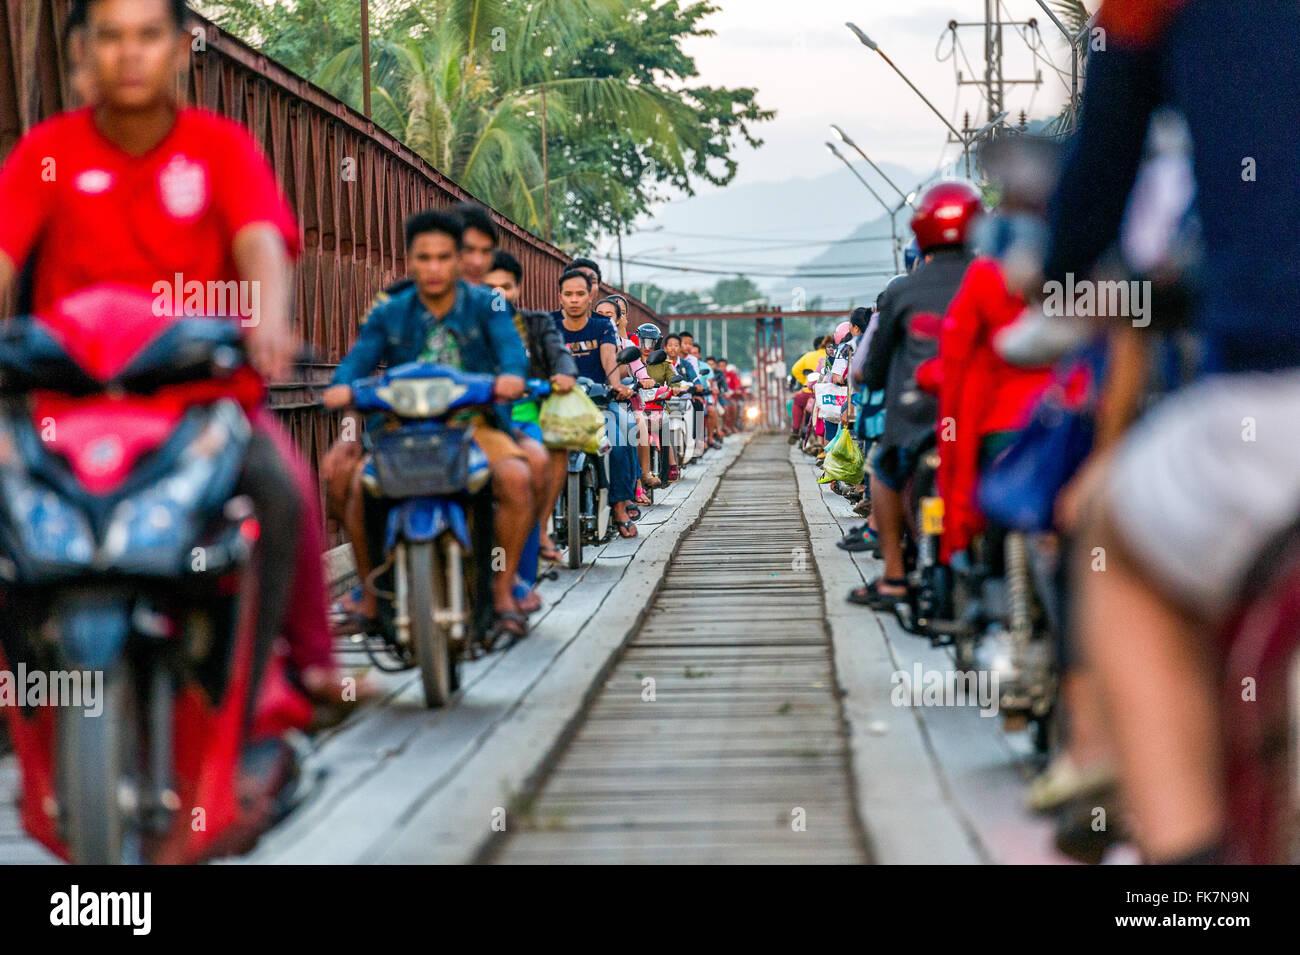 Asien. Süd-Ost-Asien. Laos. Luang Prabang, Verkehr auf der Brücke über den Fluss Nam Khan. Stockbild